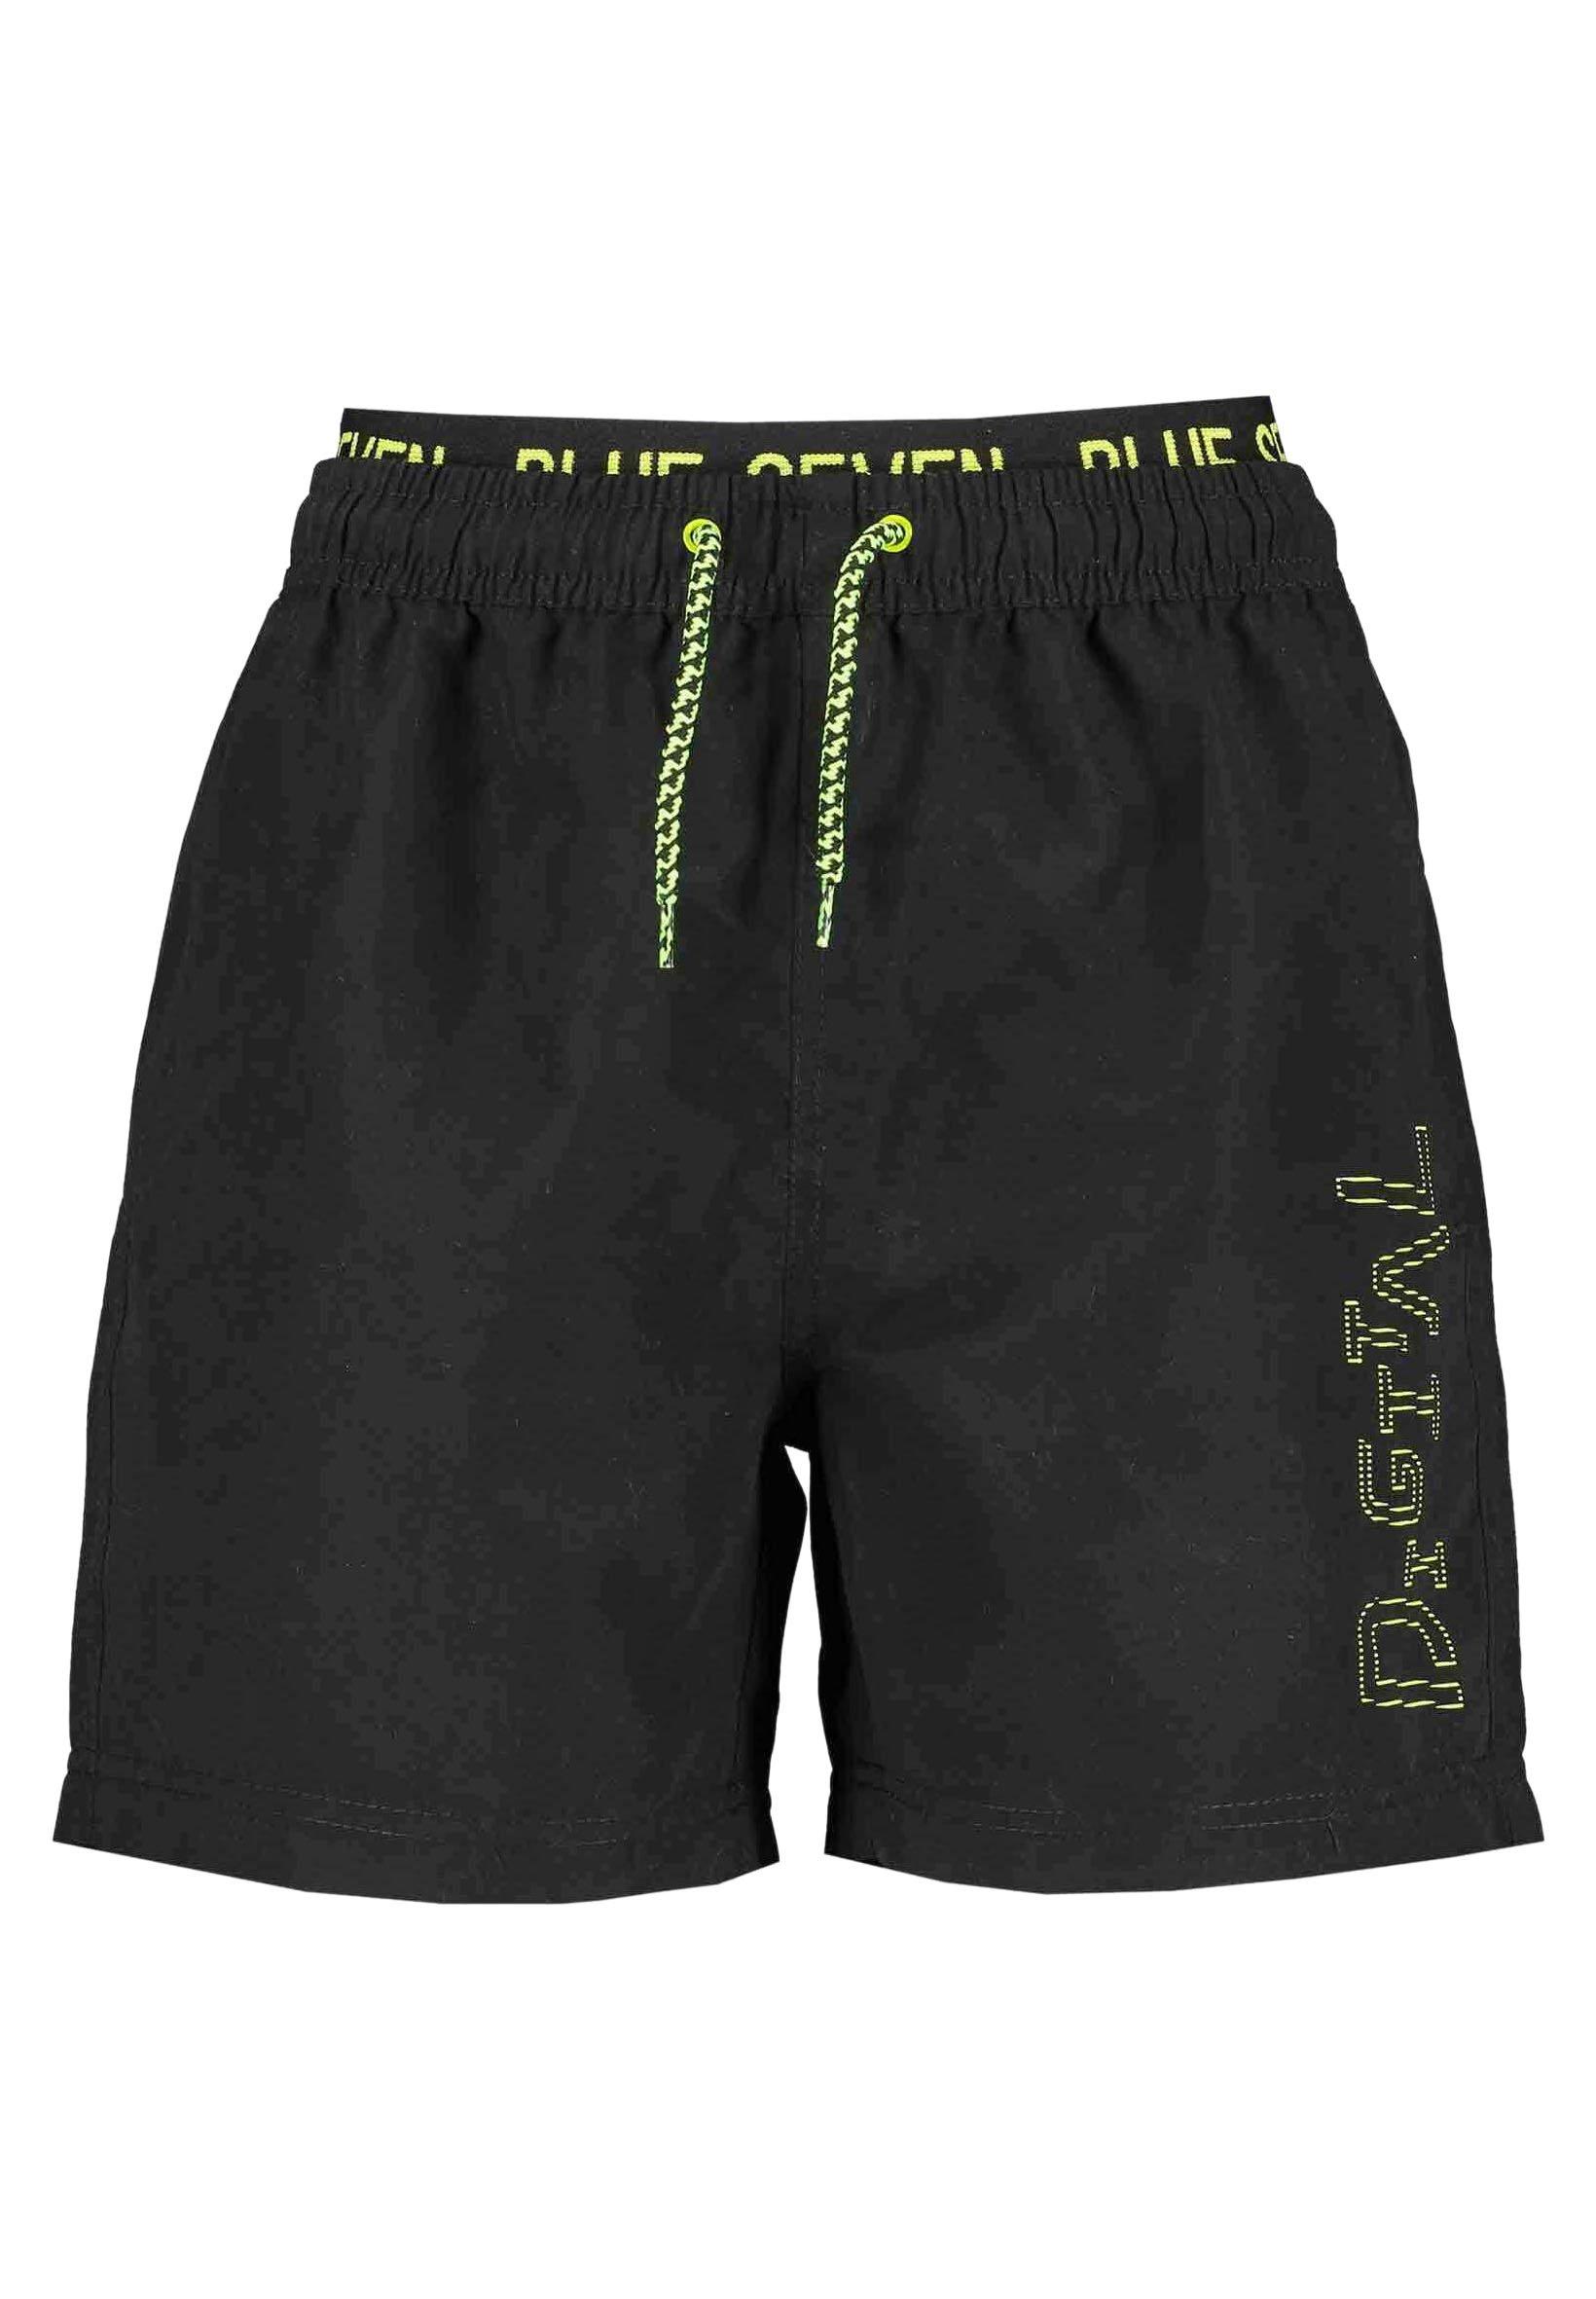 Kinder BASICS - Badehose Pants